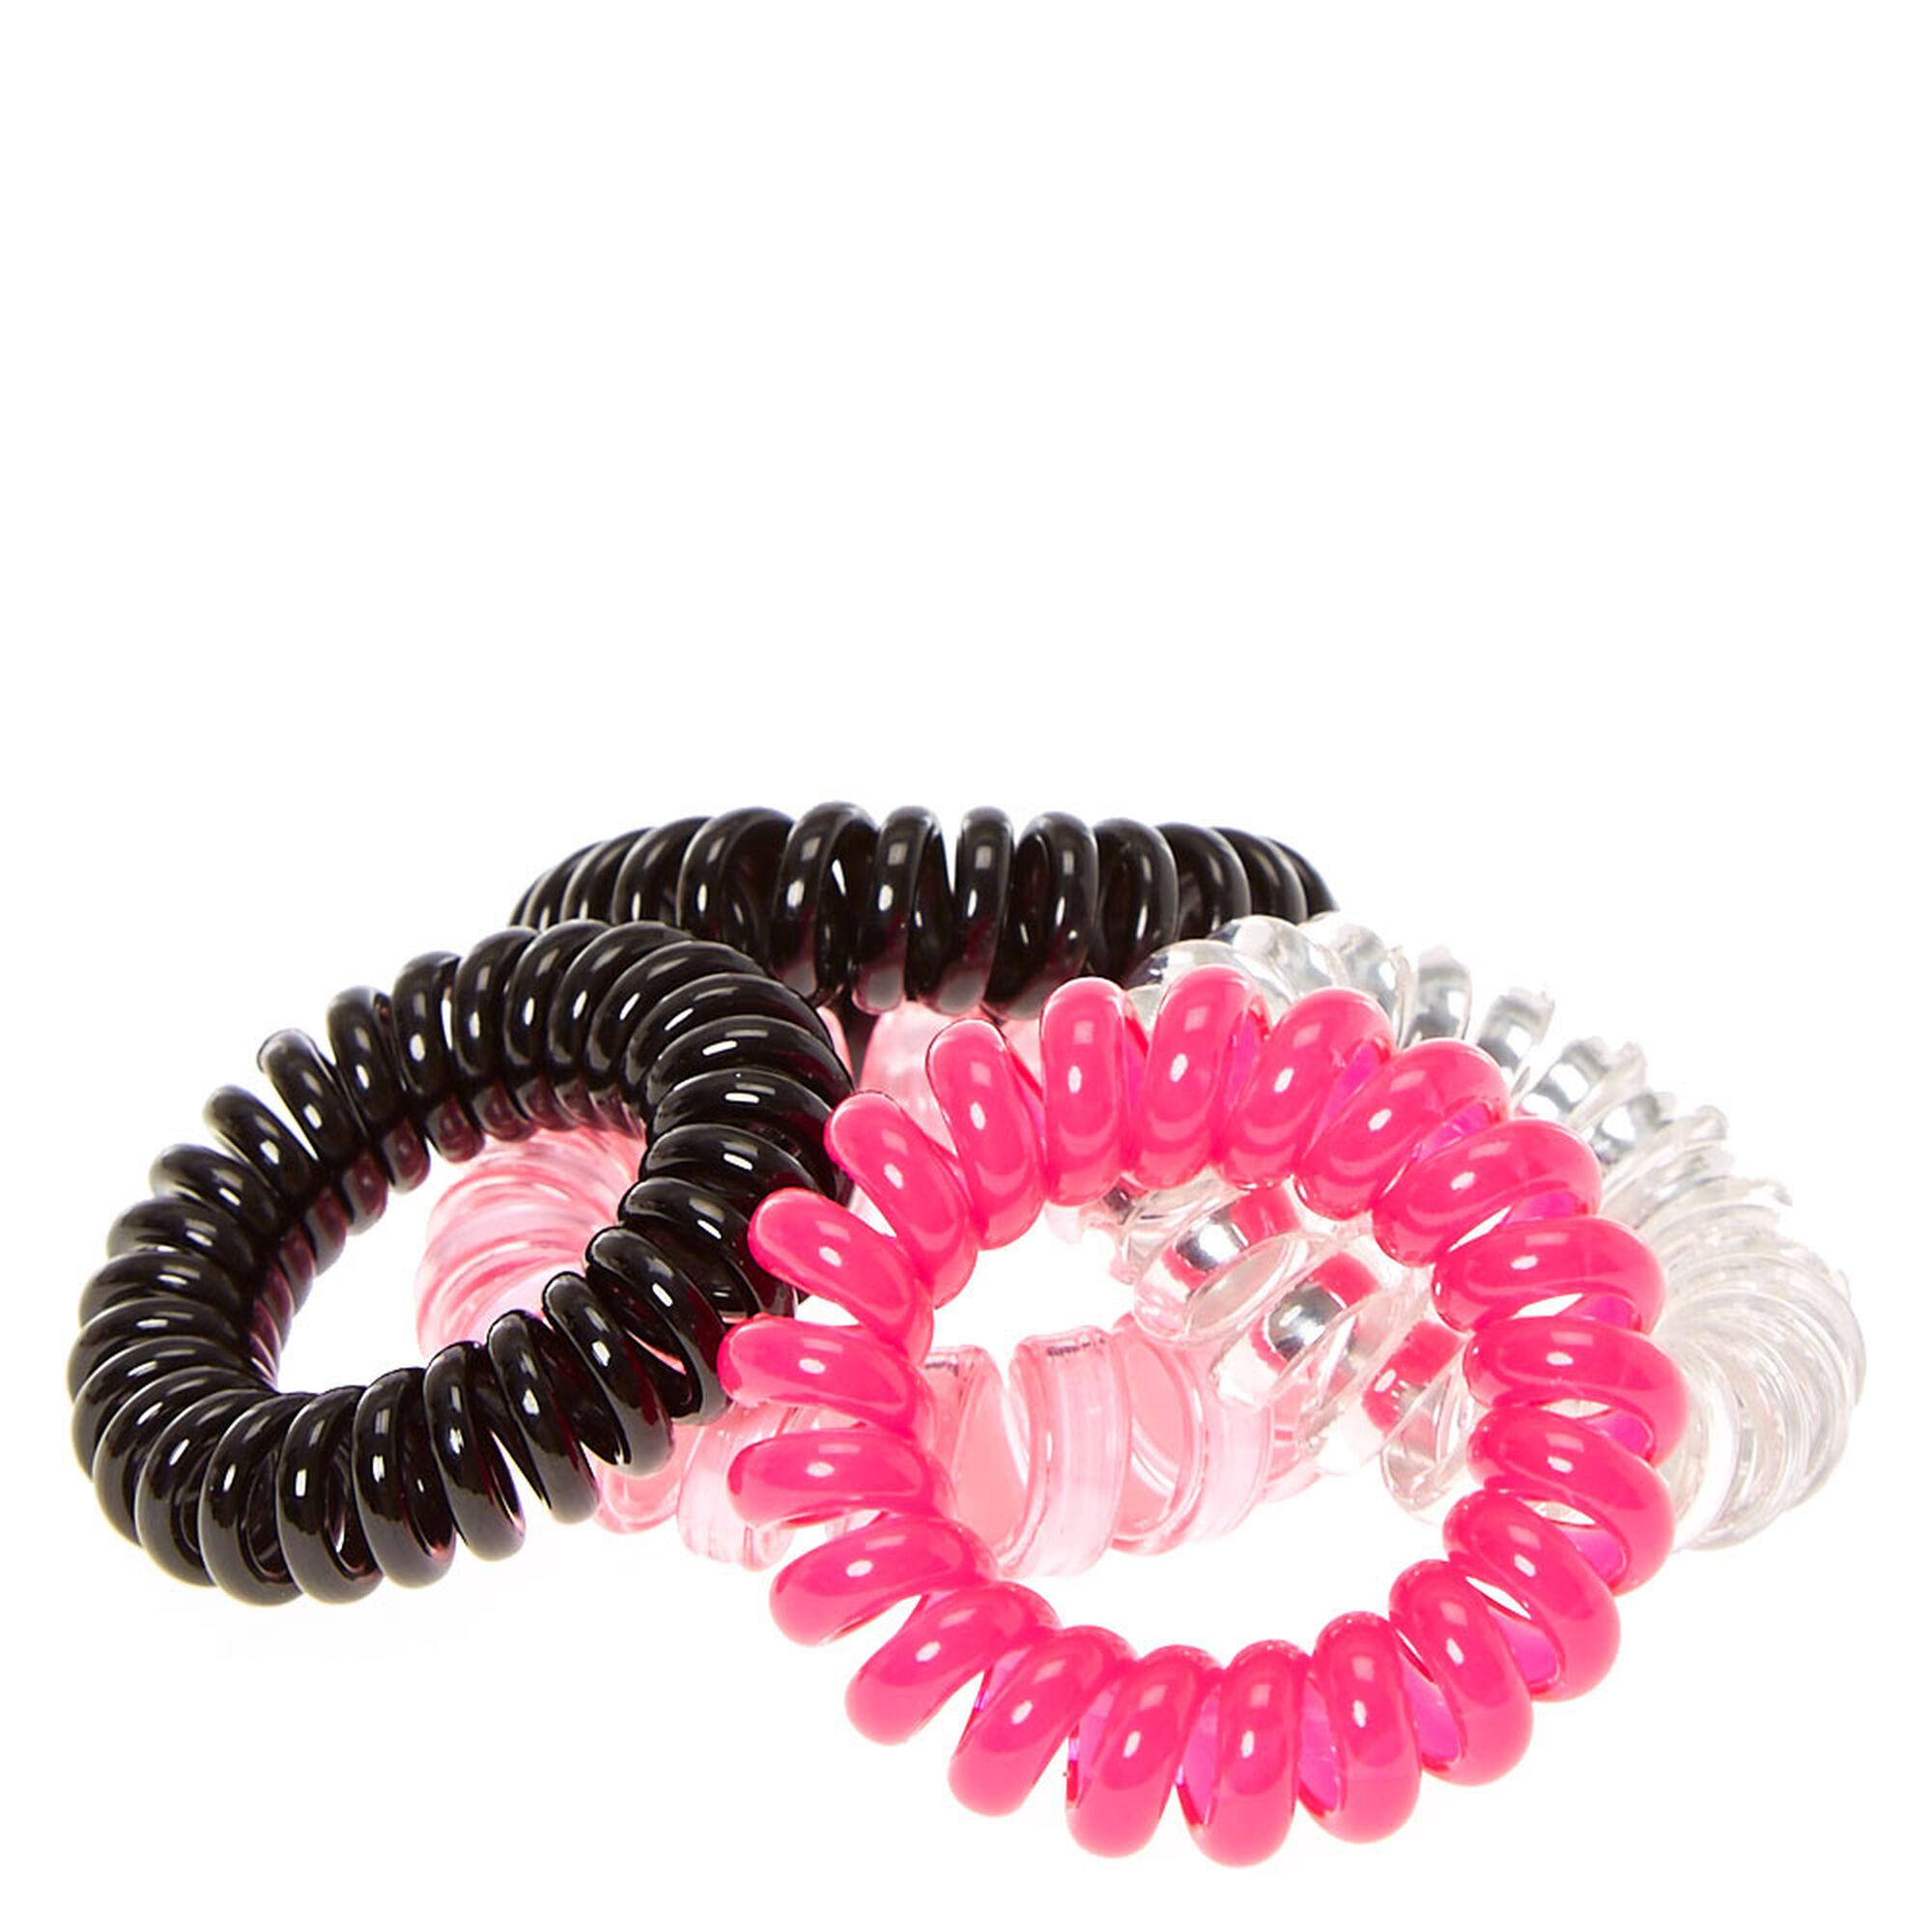 ... Black  amp  Pink Mini Coiled Hair Ties 2caa3fd9675